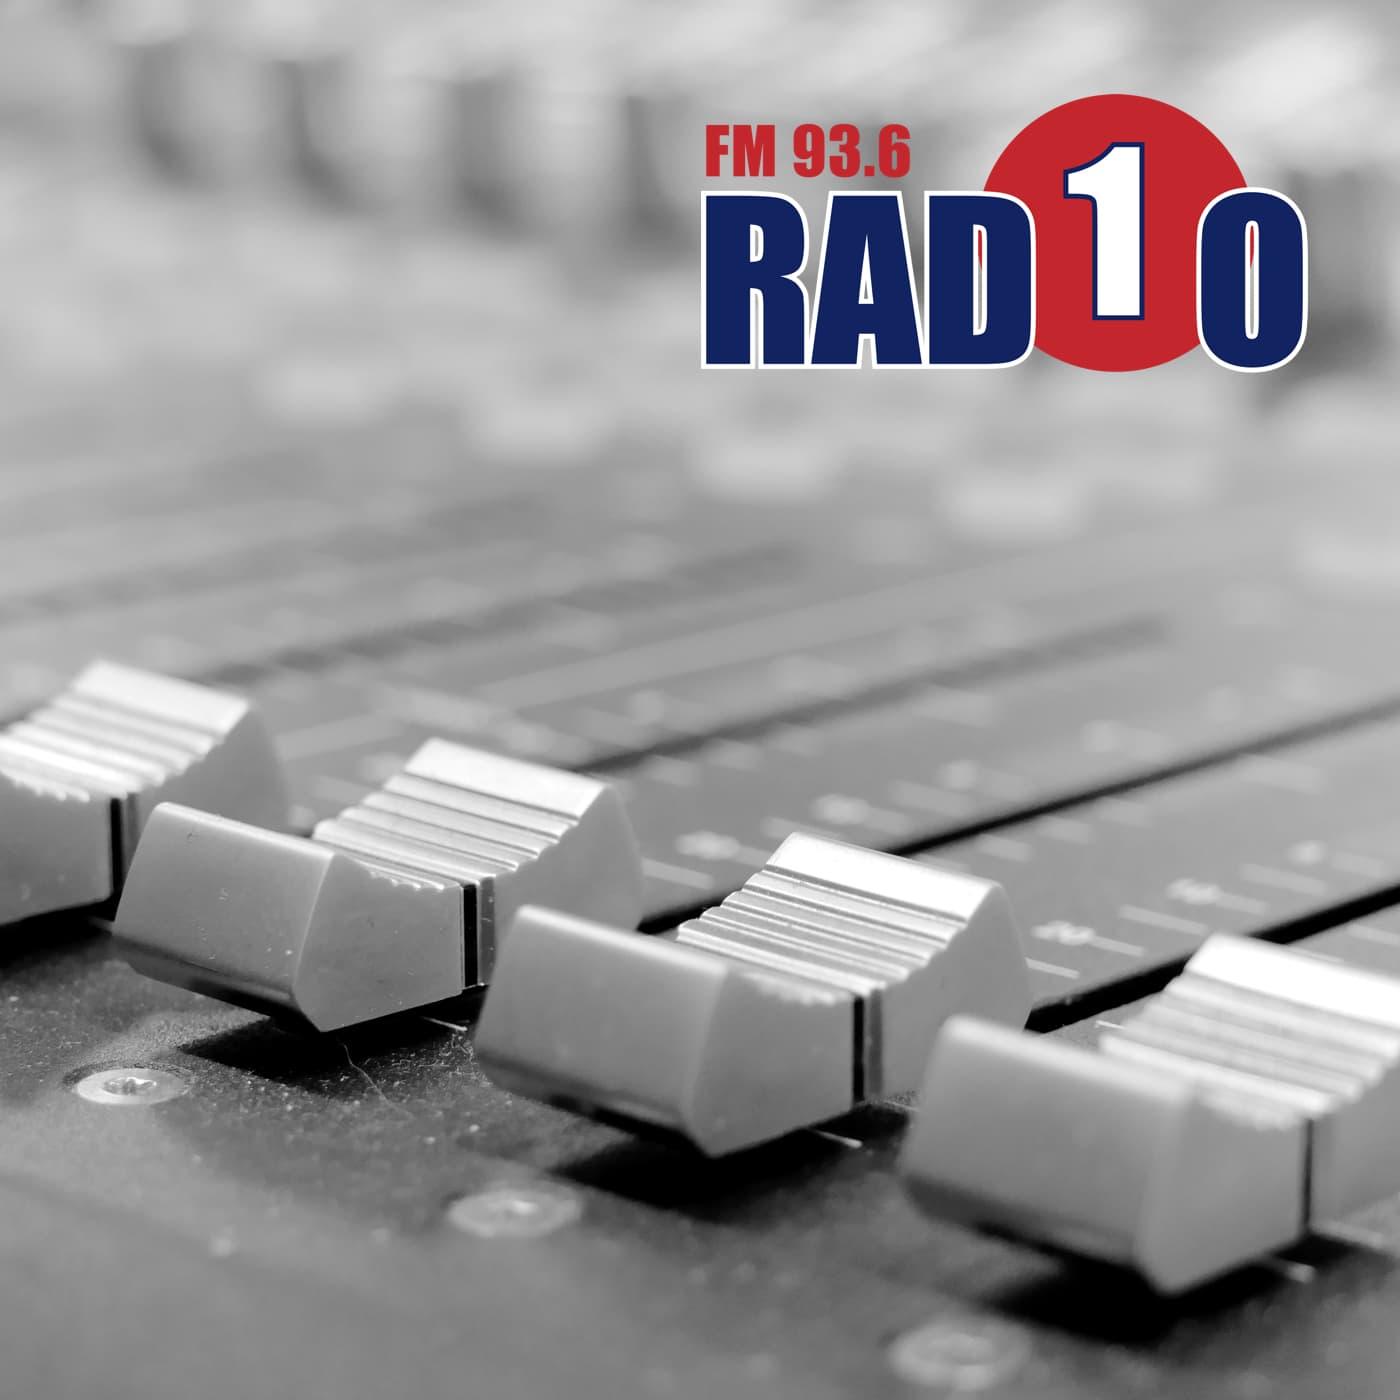 Radio 1 - Breaking News